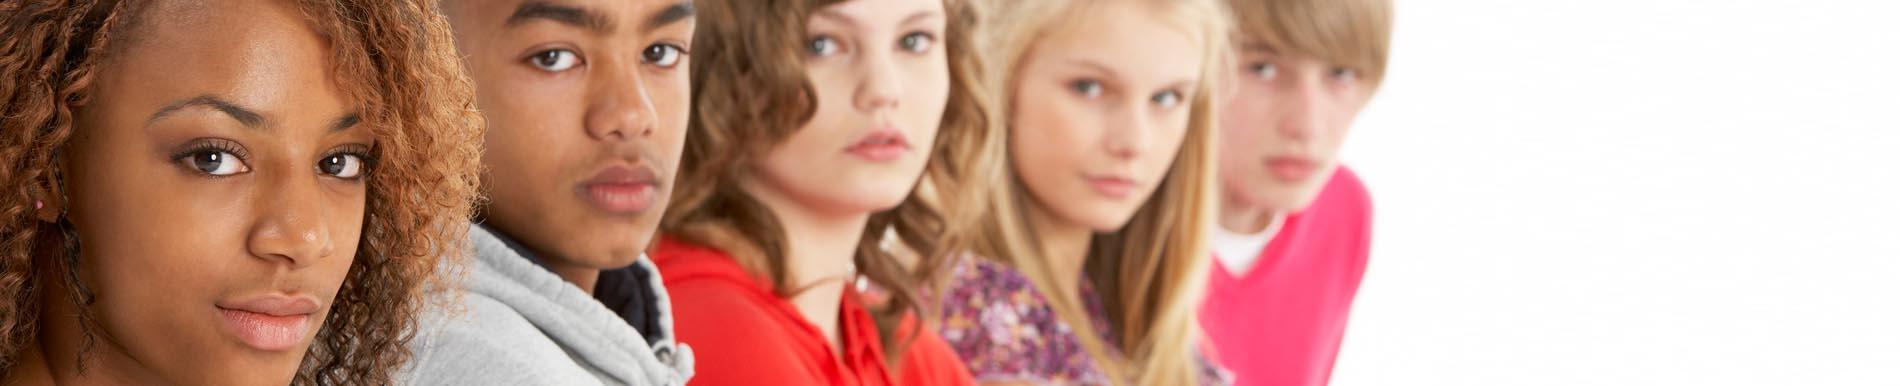 https://www.healthychildren.org/SiteCollectionImage-Homepage-Banners/HIVTesting_banner.jpg